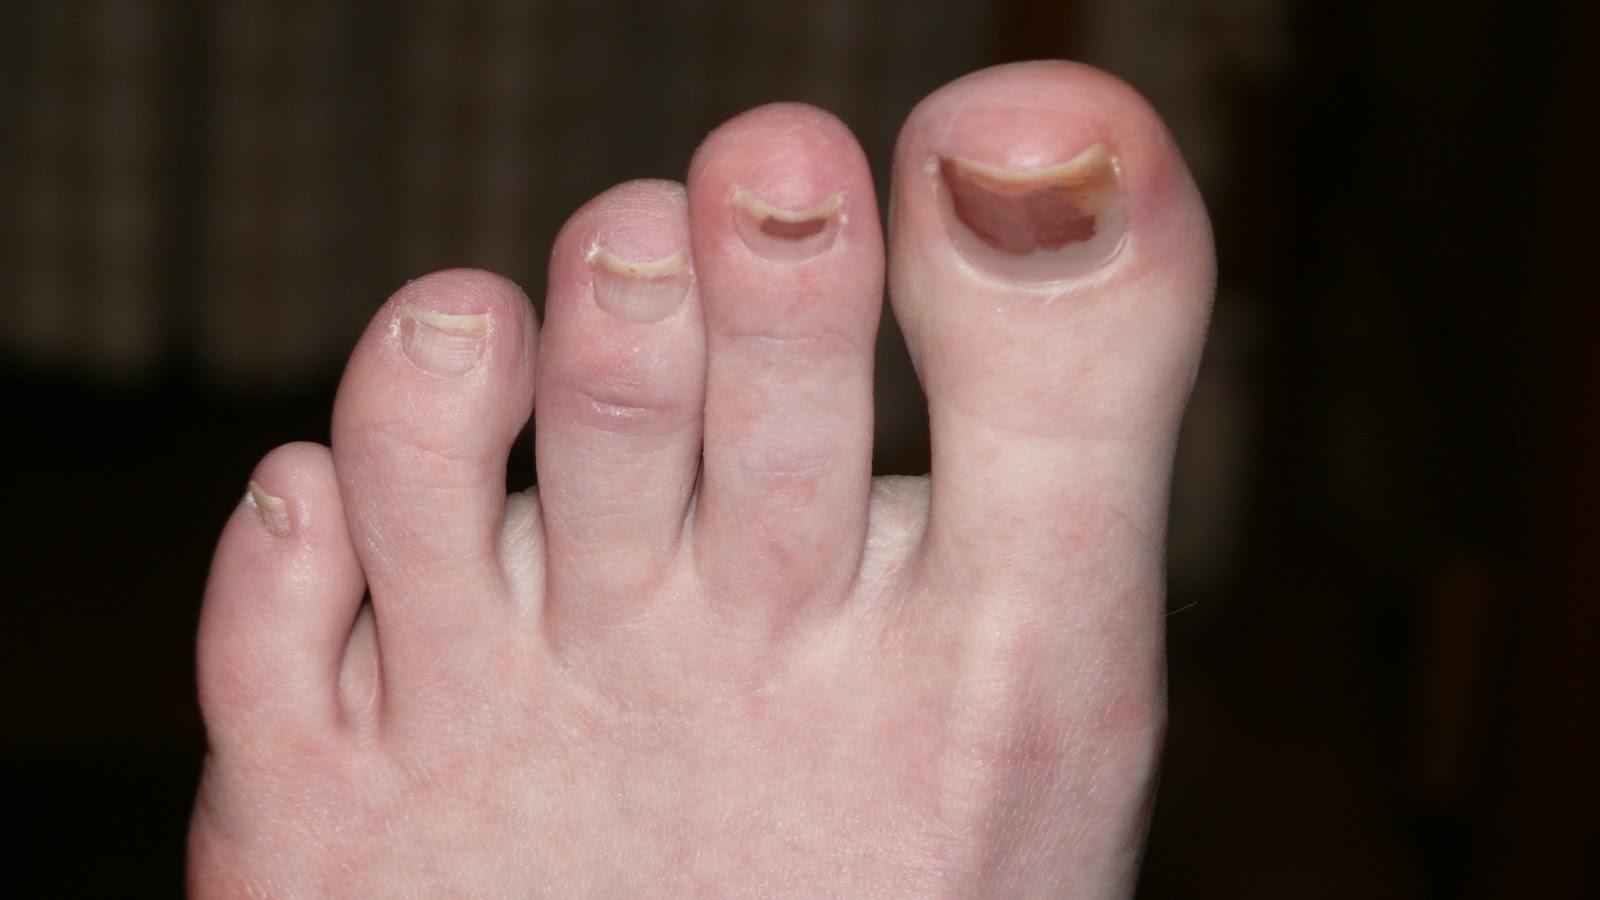 Foot Fetish Cause